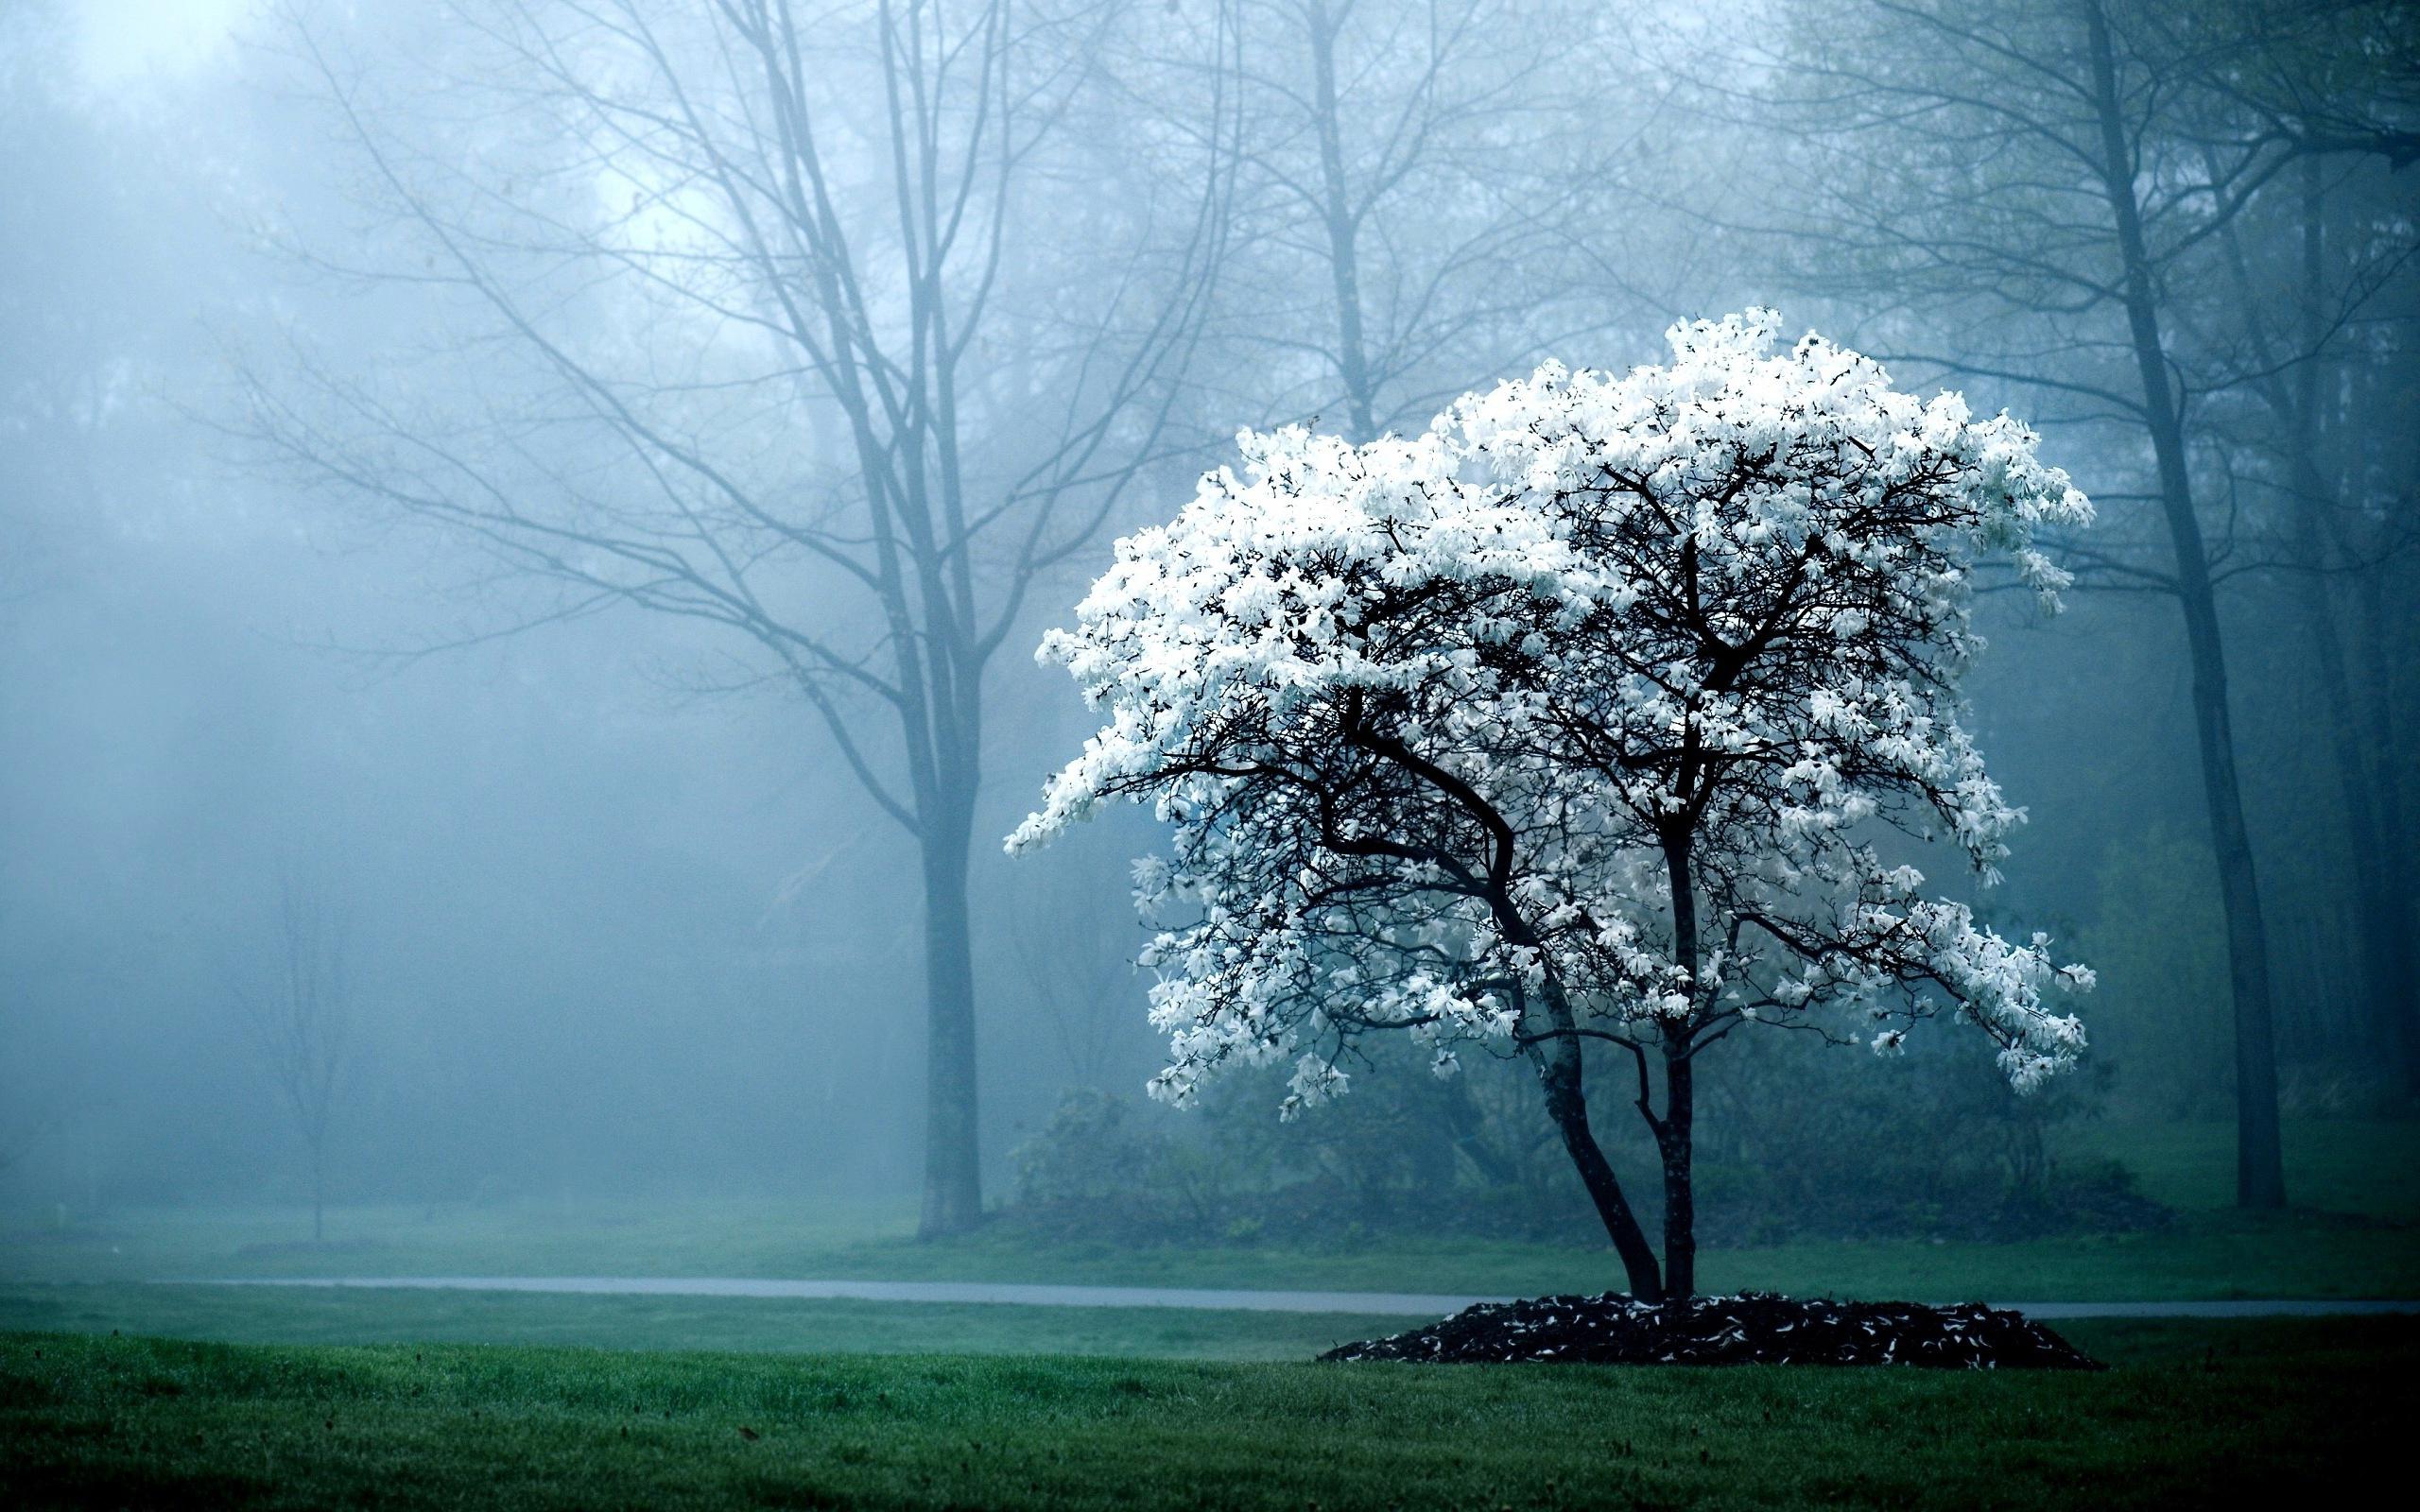 mist wallpaper winter